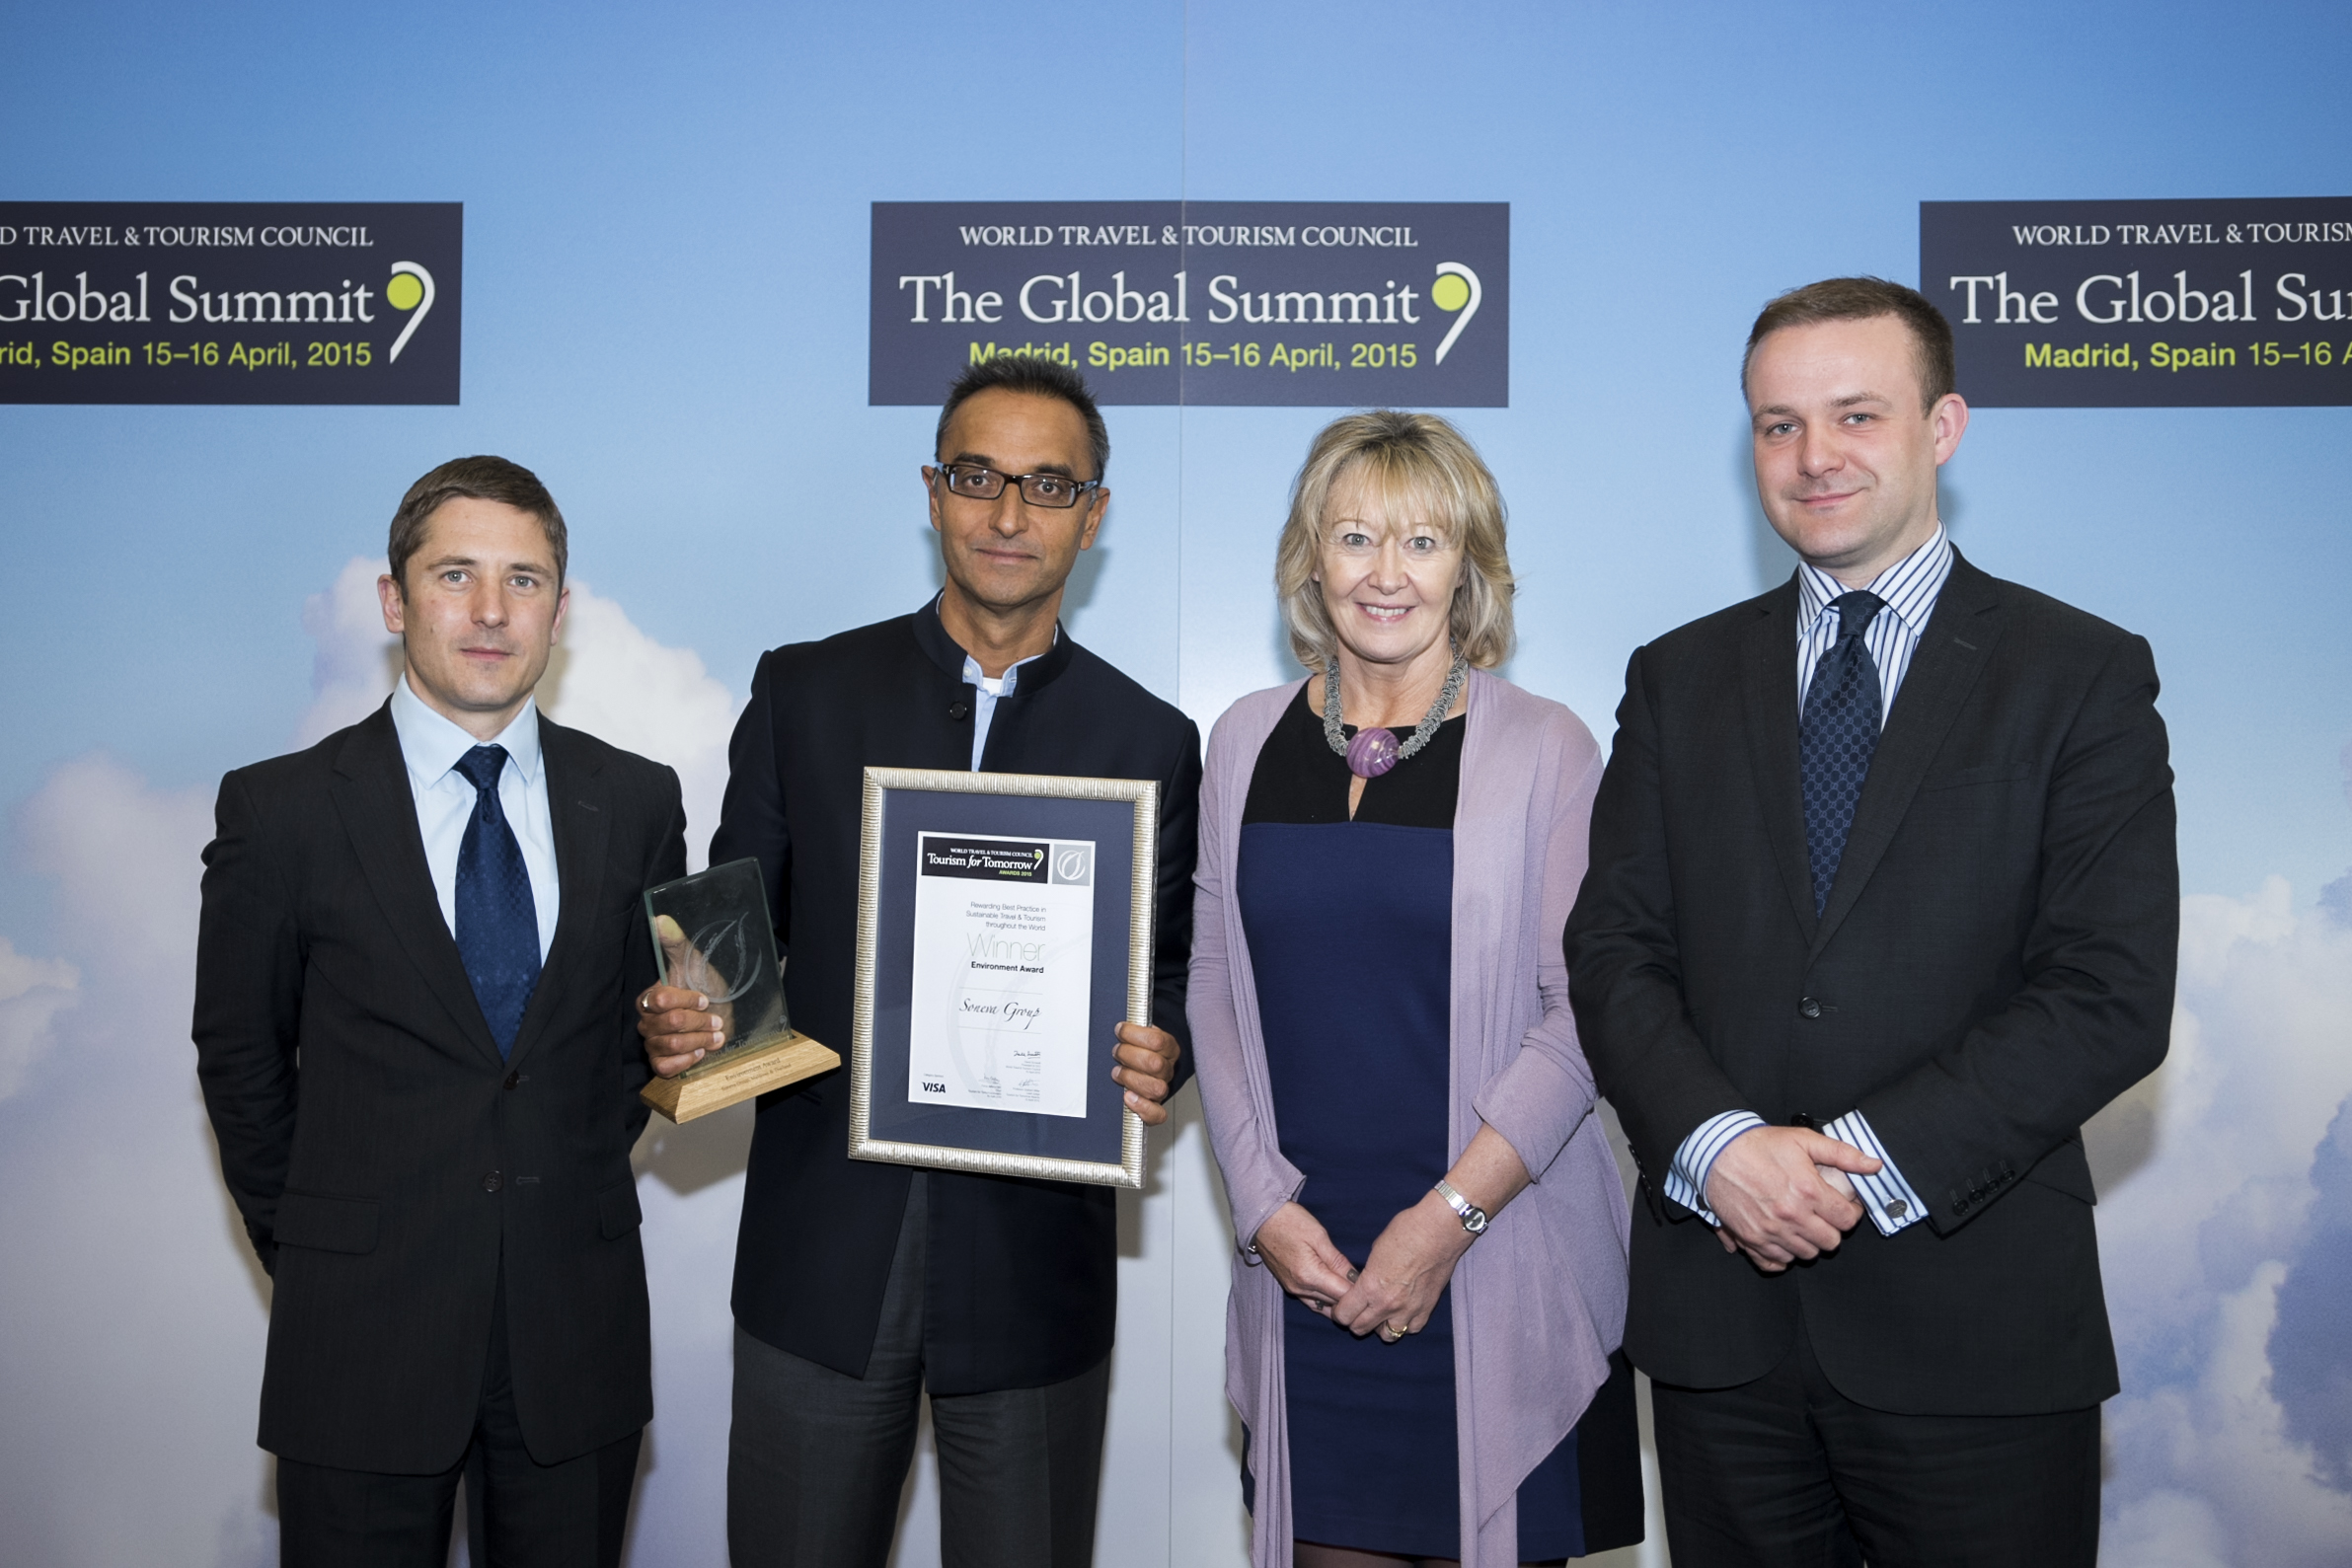 Sonu Shivdasani of Soneva accepting WTTC award